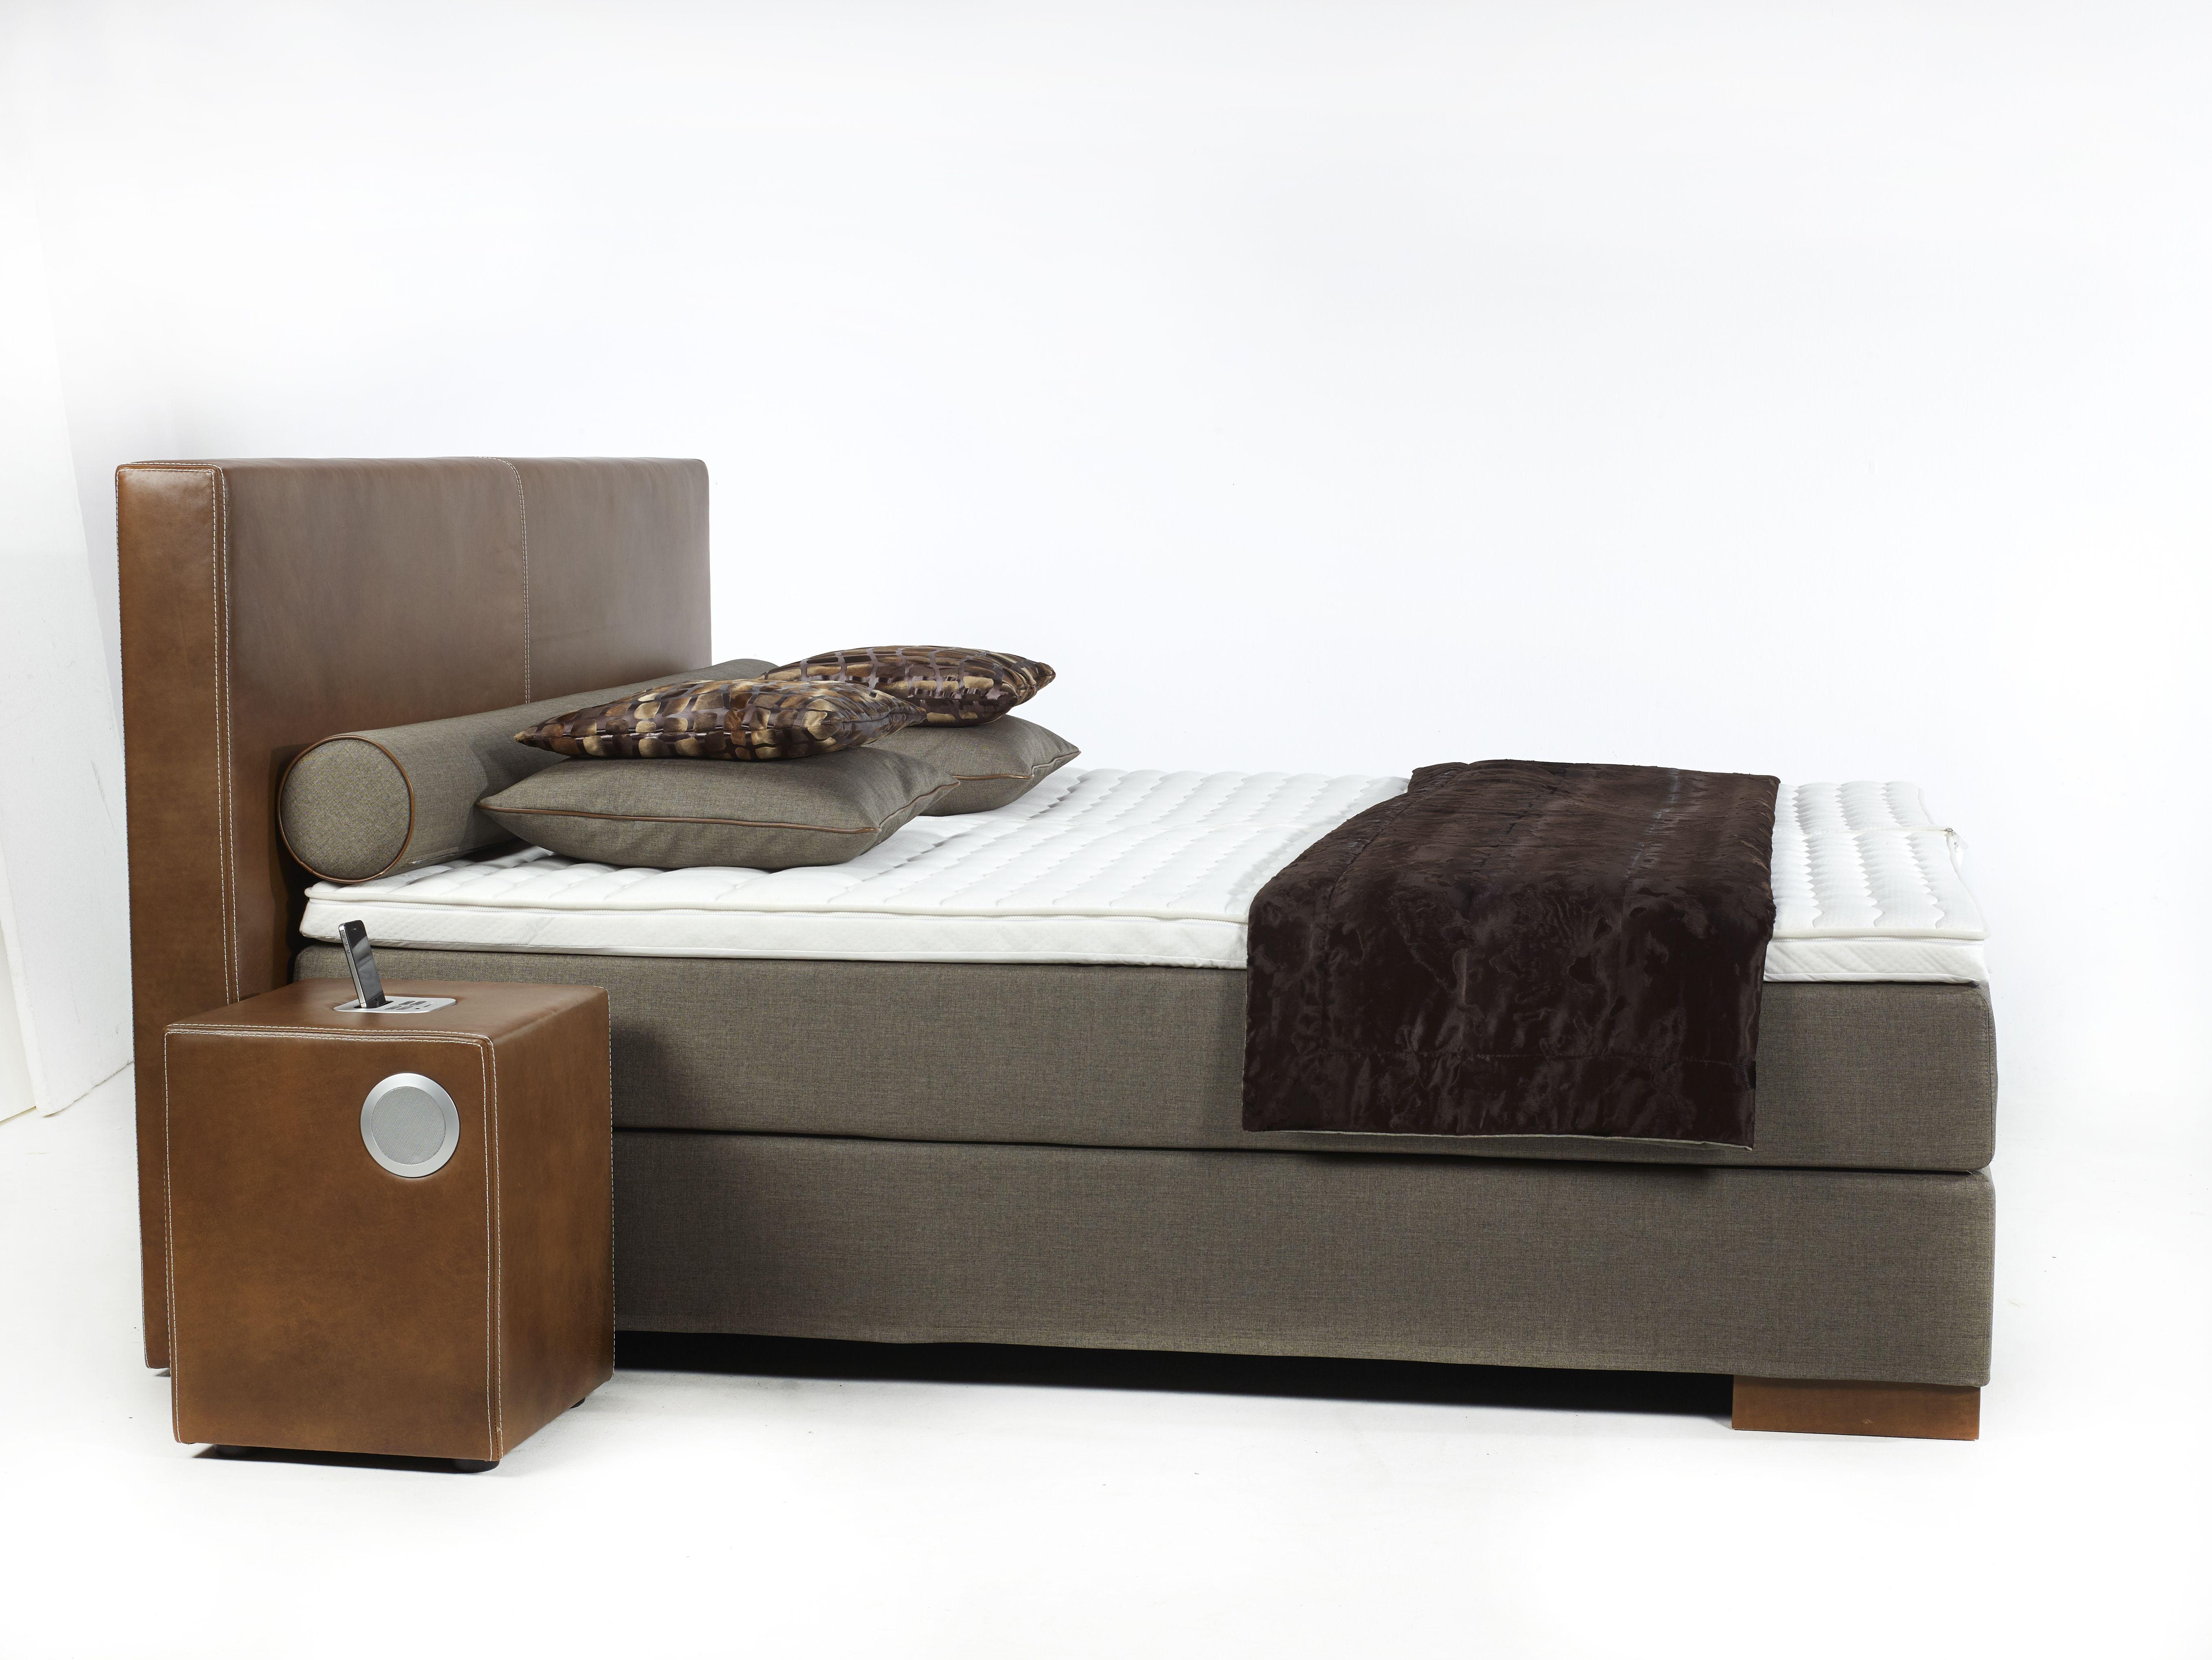 boxspring bett selber bauen swalif. Black Bedroom Furniture Sets. Home Design Ideas